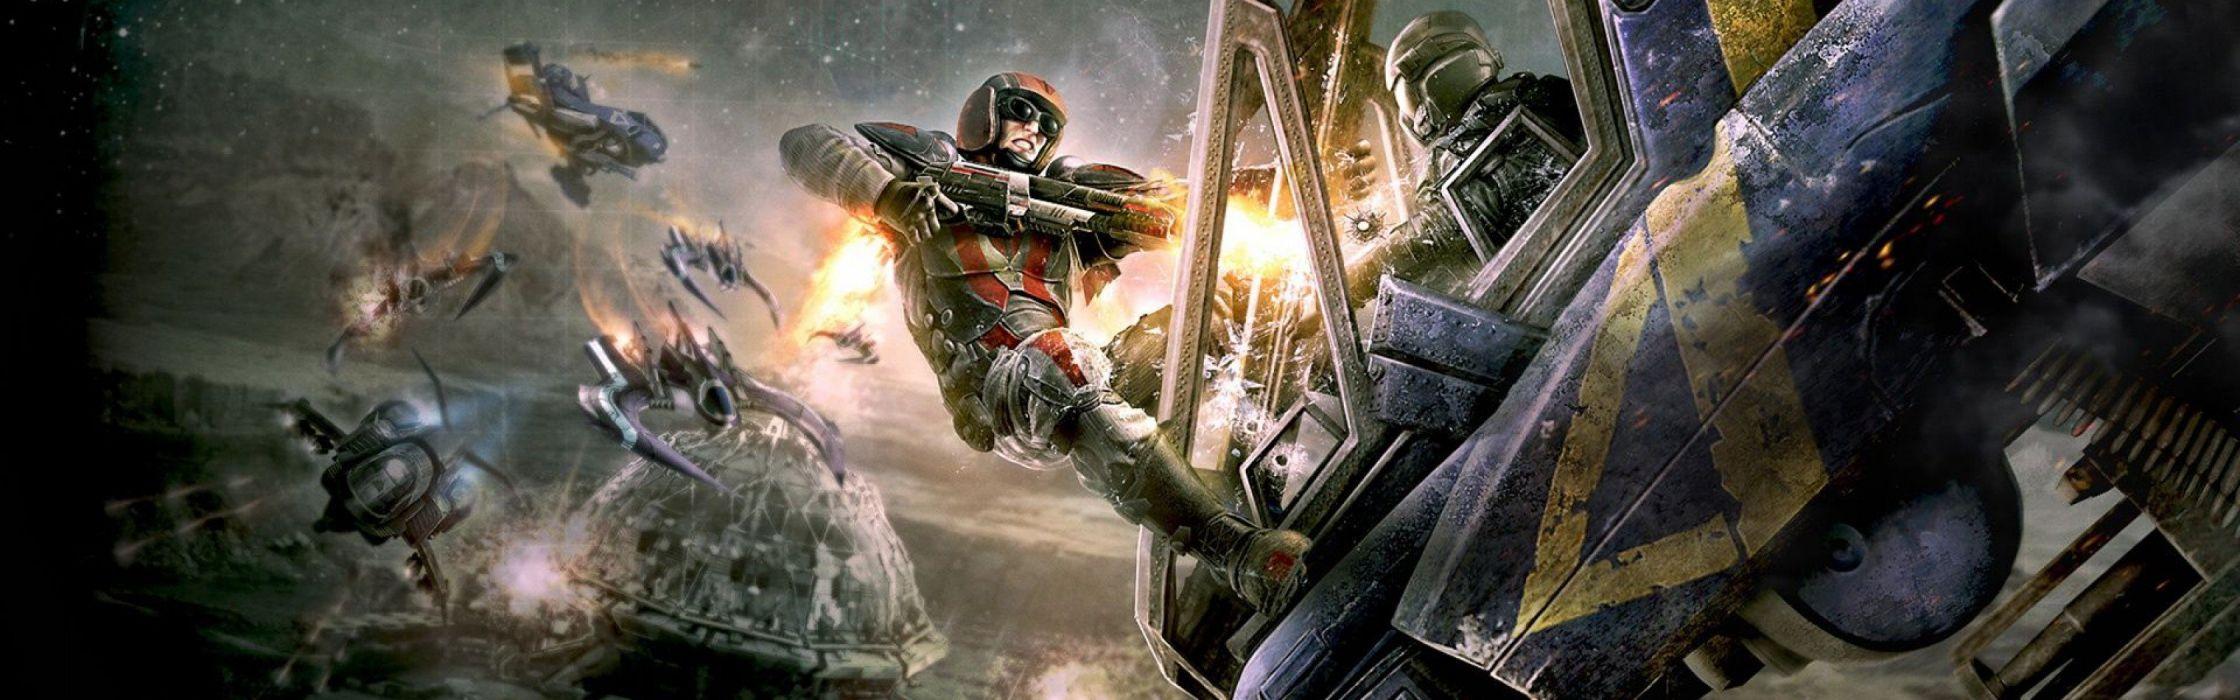 PLANETSIDE 2 sci-fi shooter futuristic sci-fi action warrior armor wallpaper